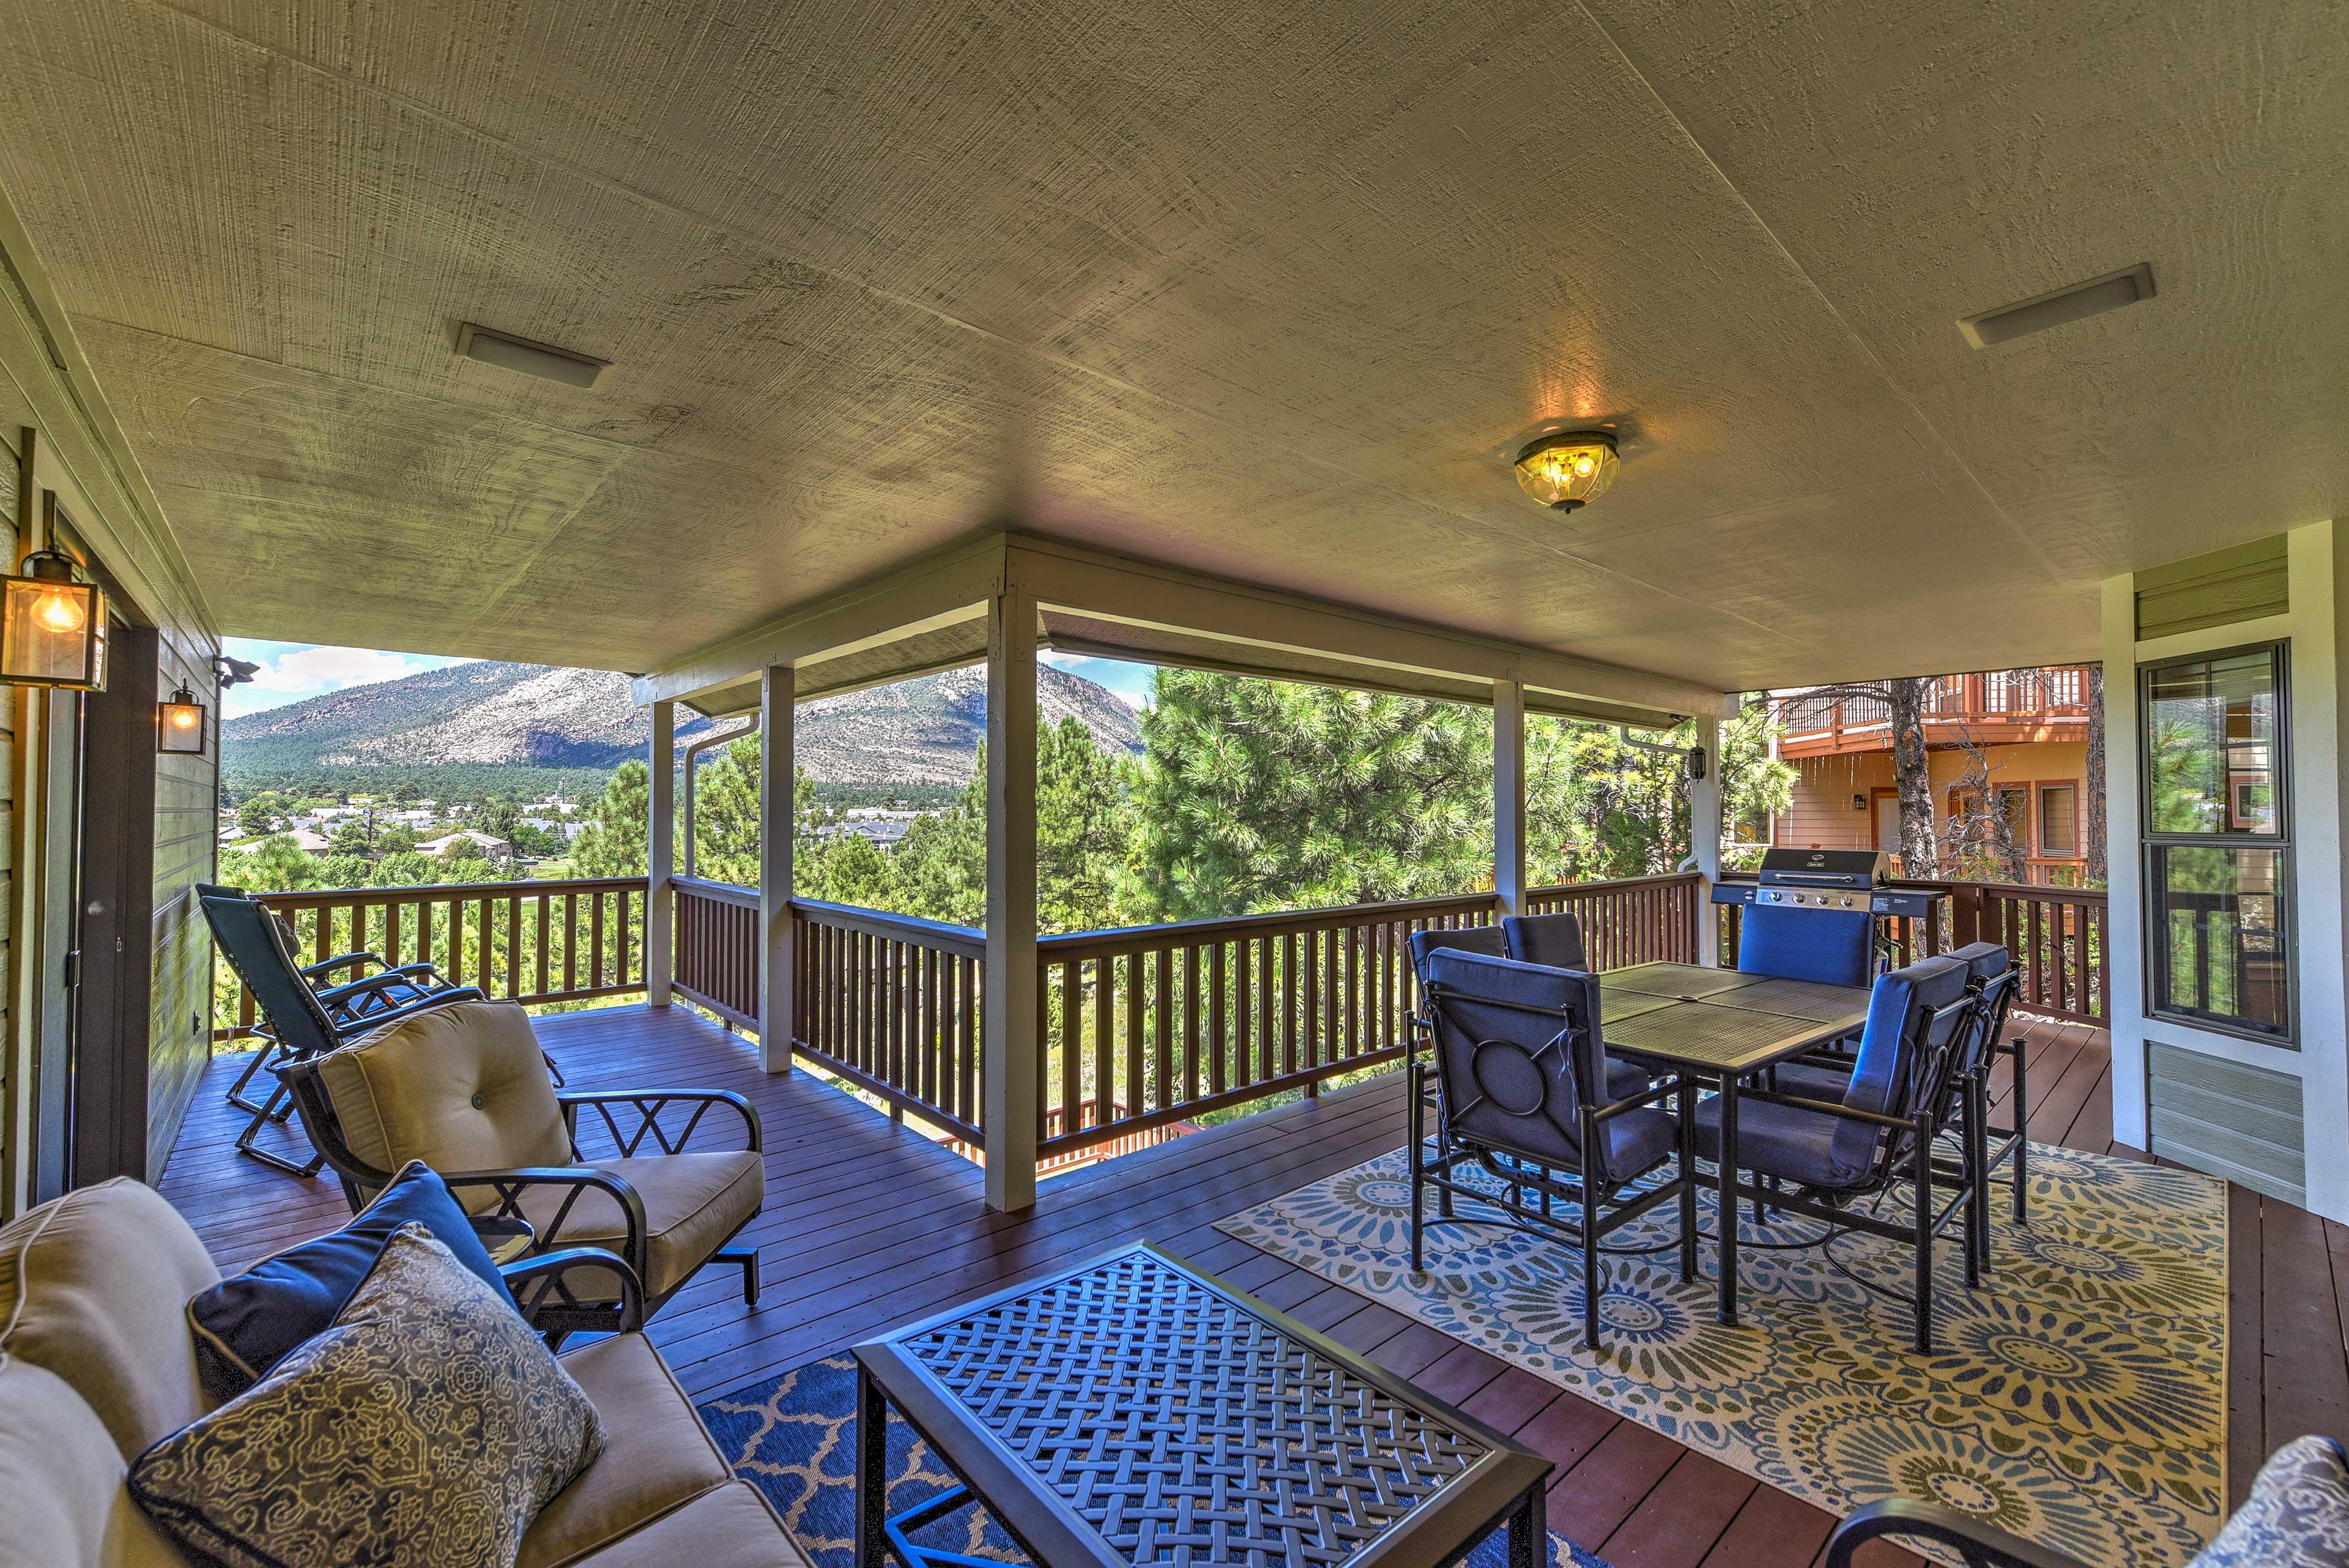 Explore Flagstaff, Arizona from this 4-bedroom, 3-bath vacation rental house!